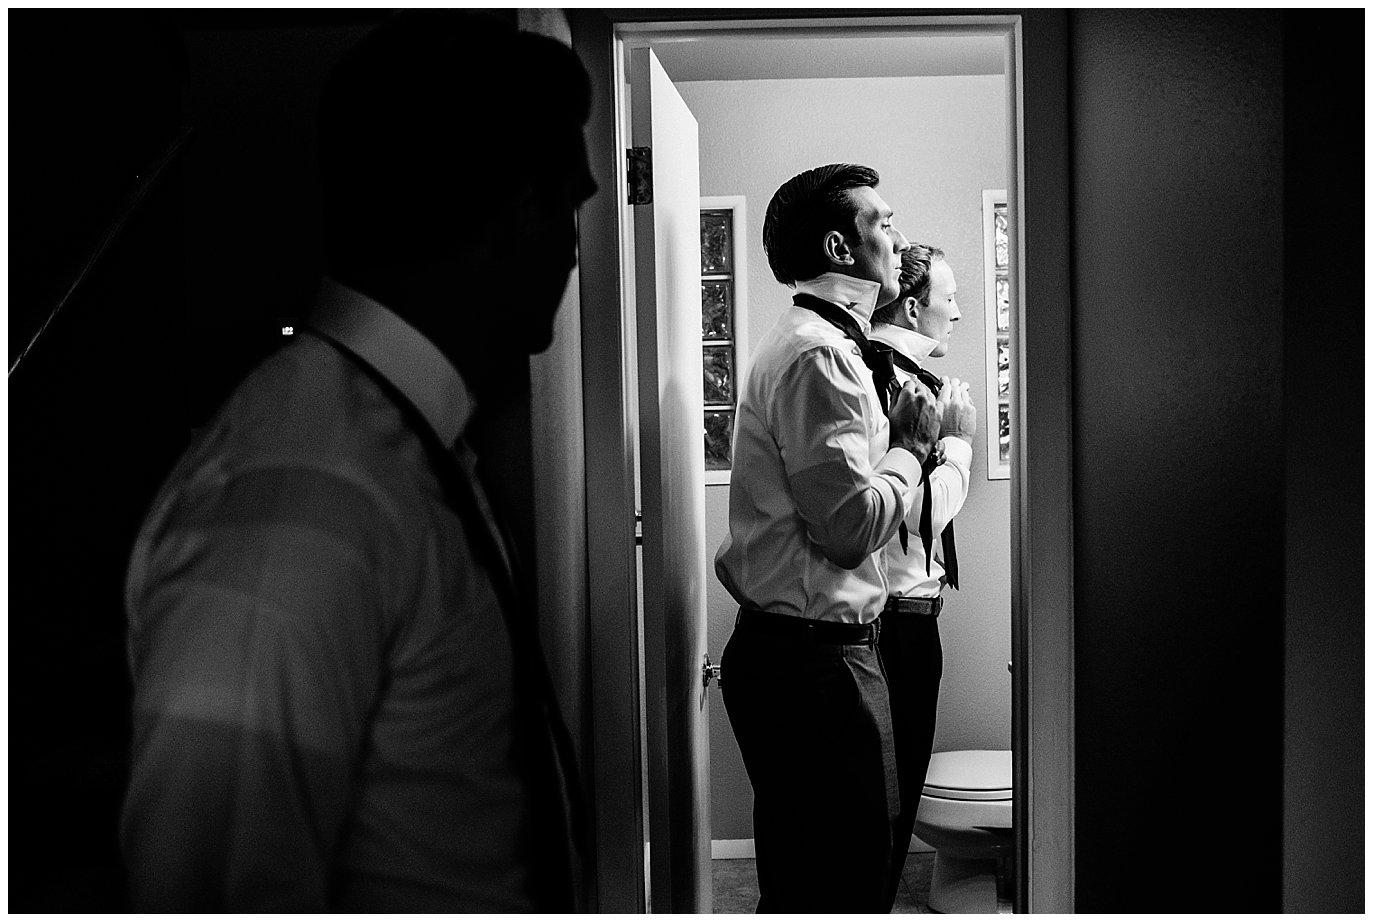 groom and groomsmen tying ties at Arapahoe Basin Black Mountain Lodge Wedding by Arapahoe Basin Wedding Photographer Jennie Crate